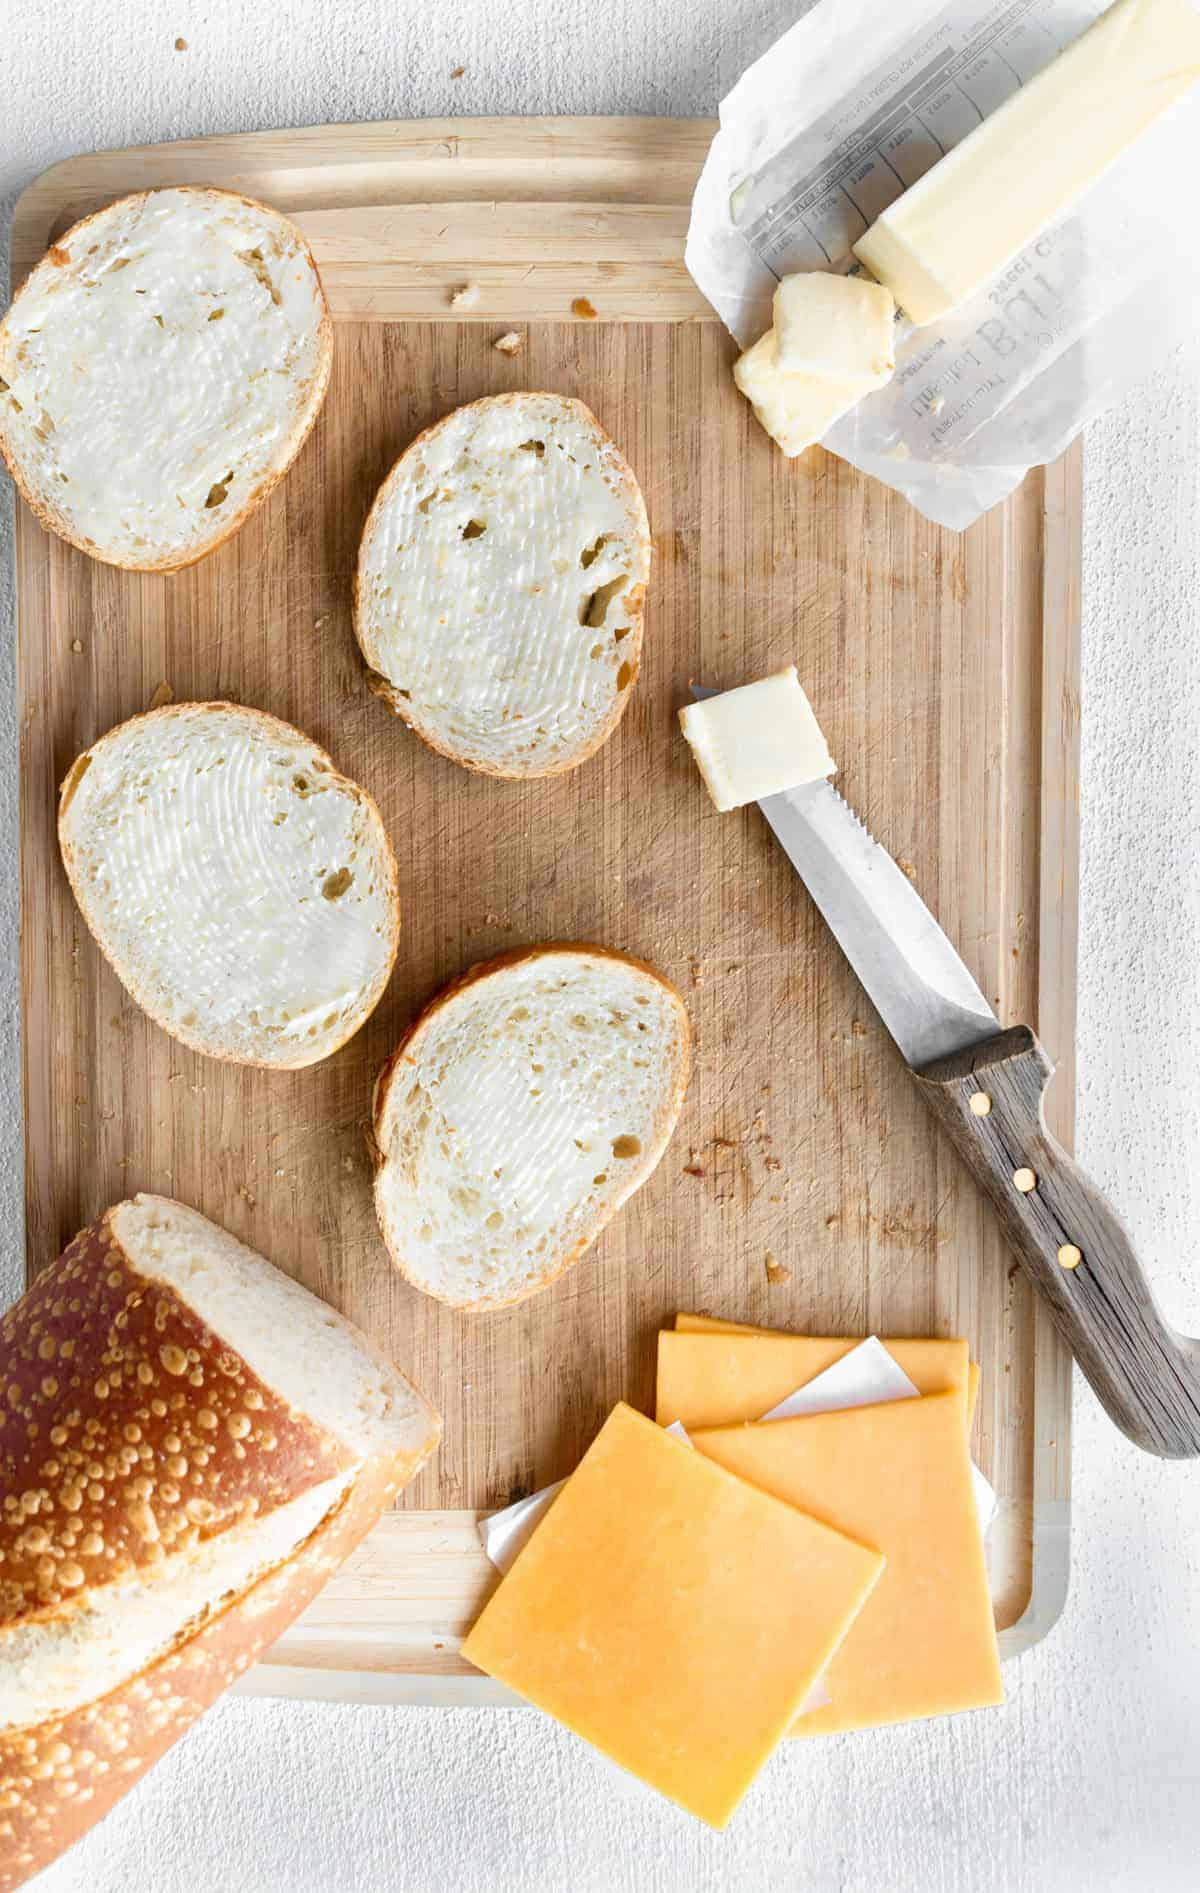 Italian bread, sliced cheese on cutting board